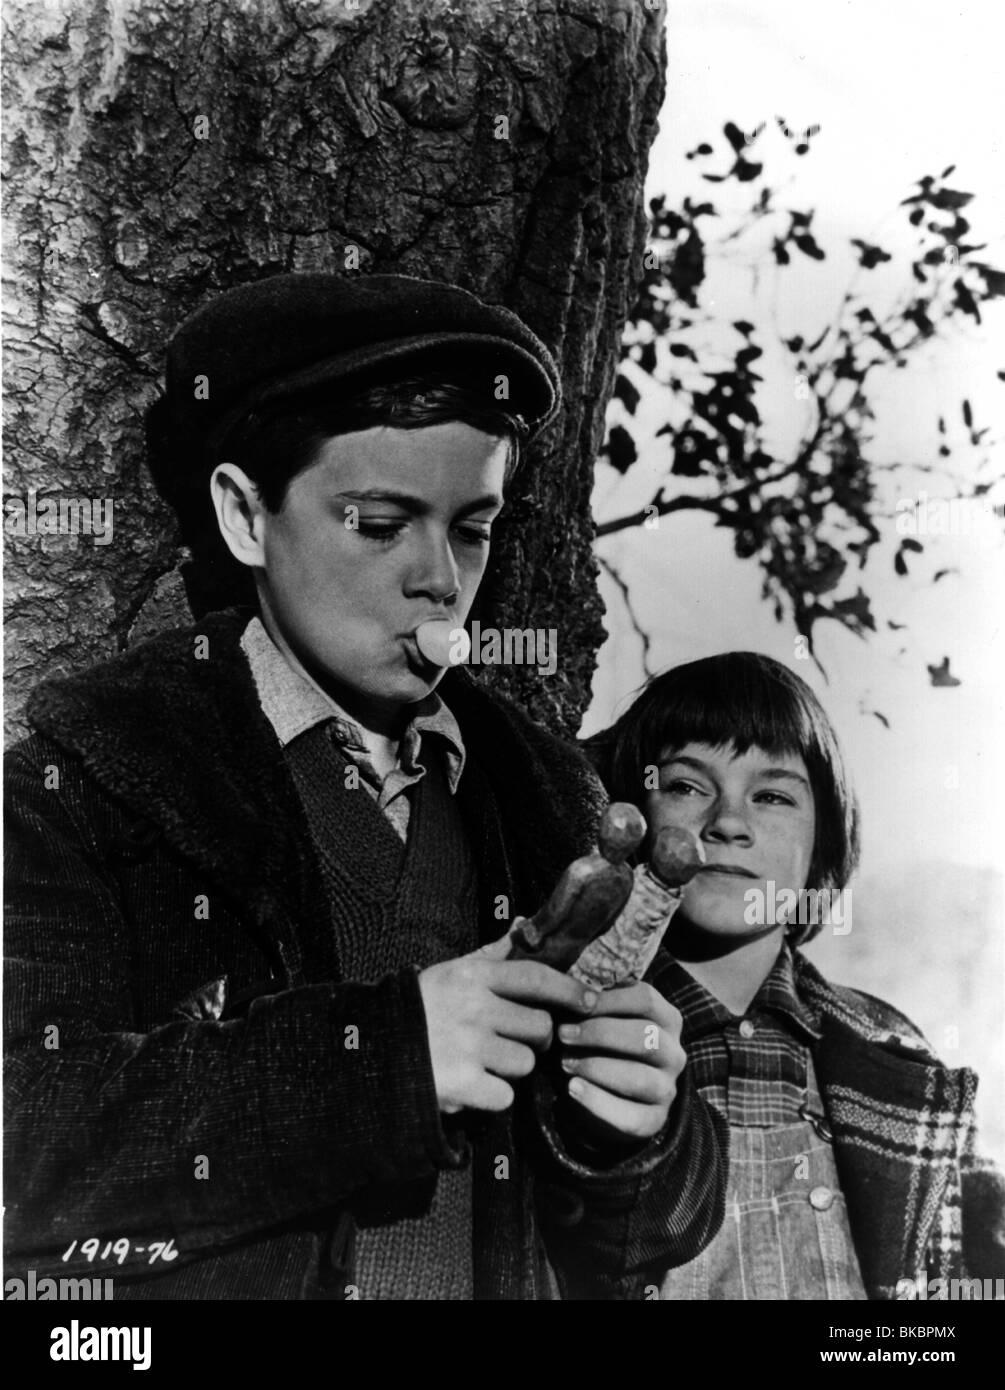 TO KILL A MOCKINGBIRD (1962) PHILLIP ALFORD, MARY BADHAM TKM 001P - Stock Image